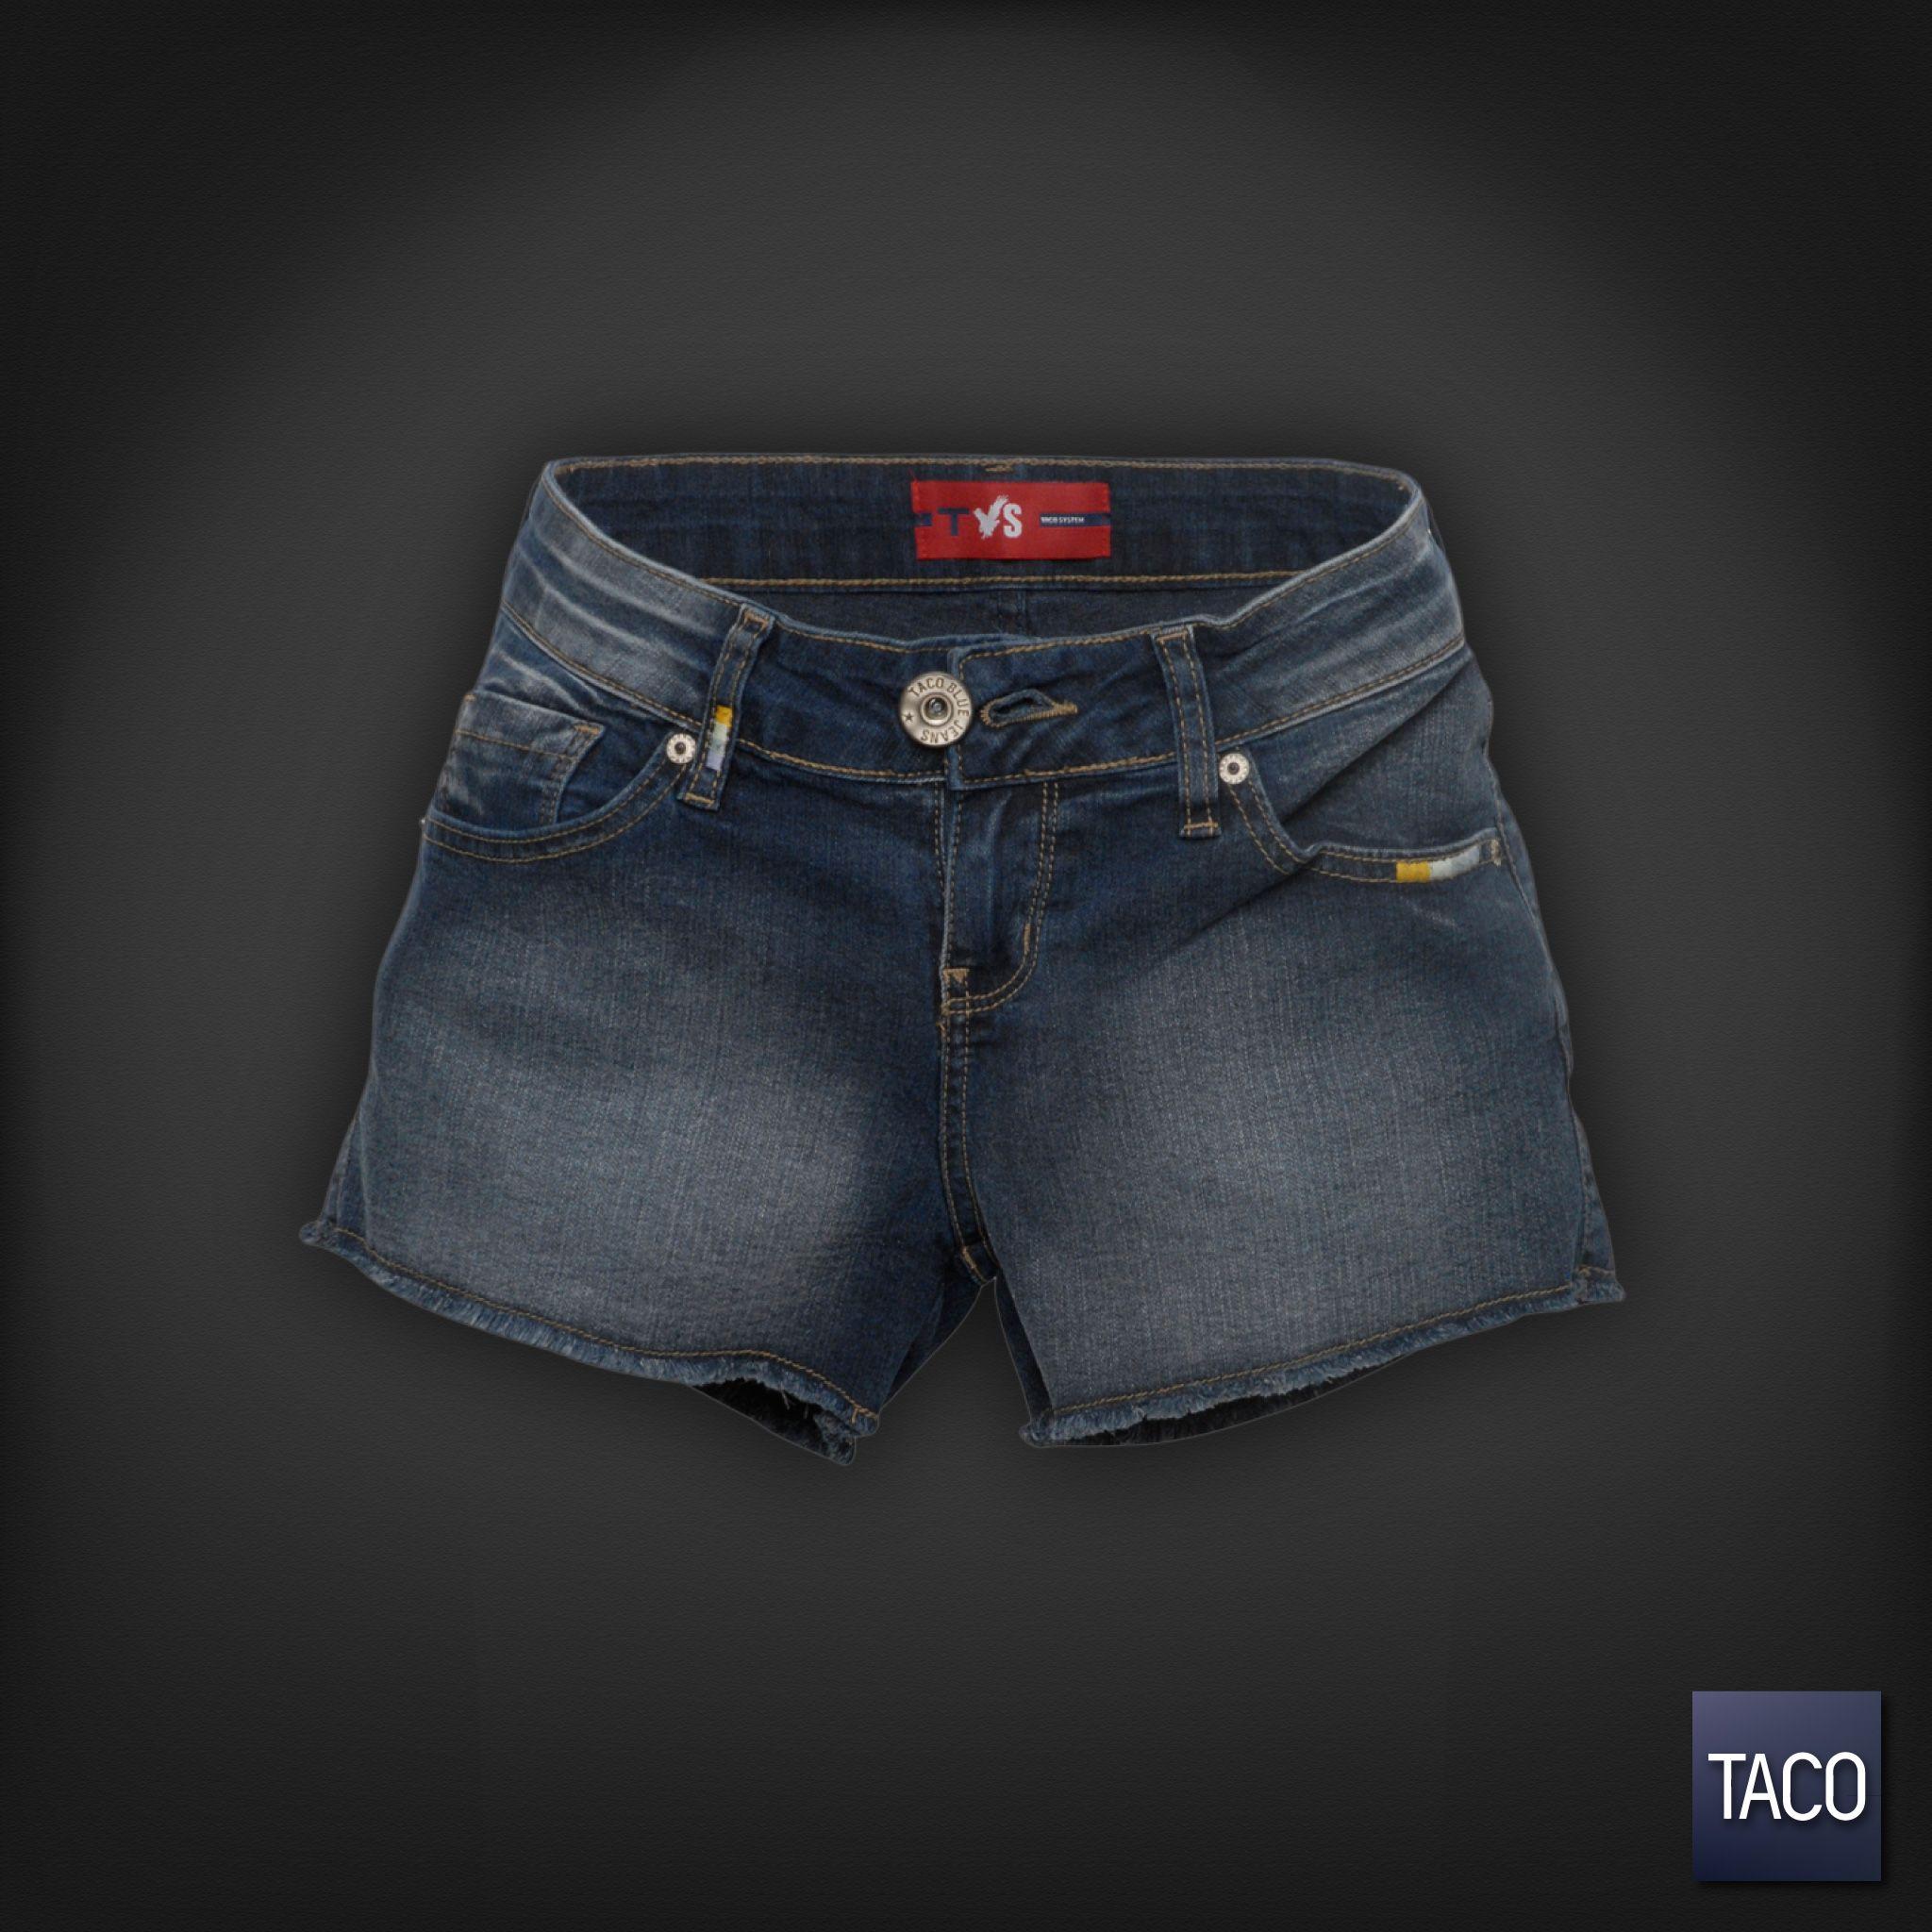 c145ec644 Short jeans feminino por R 39